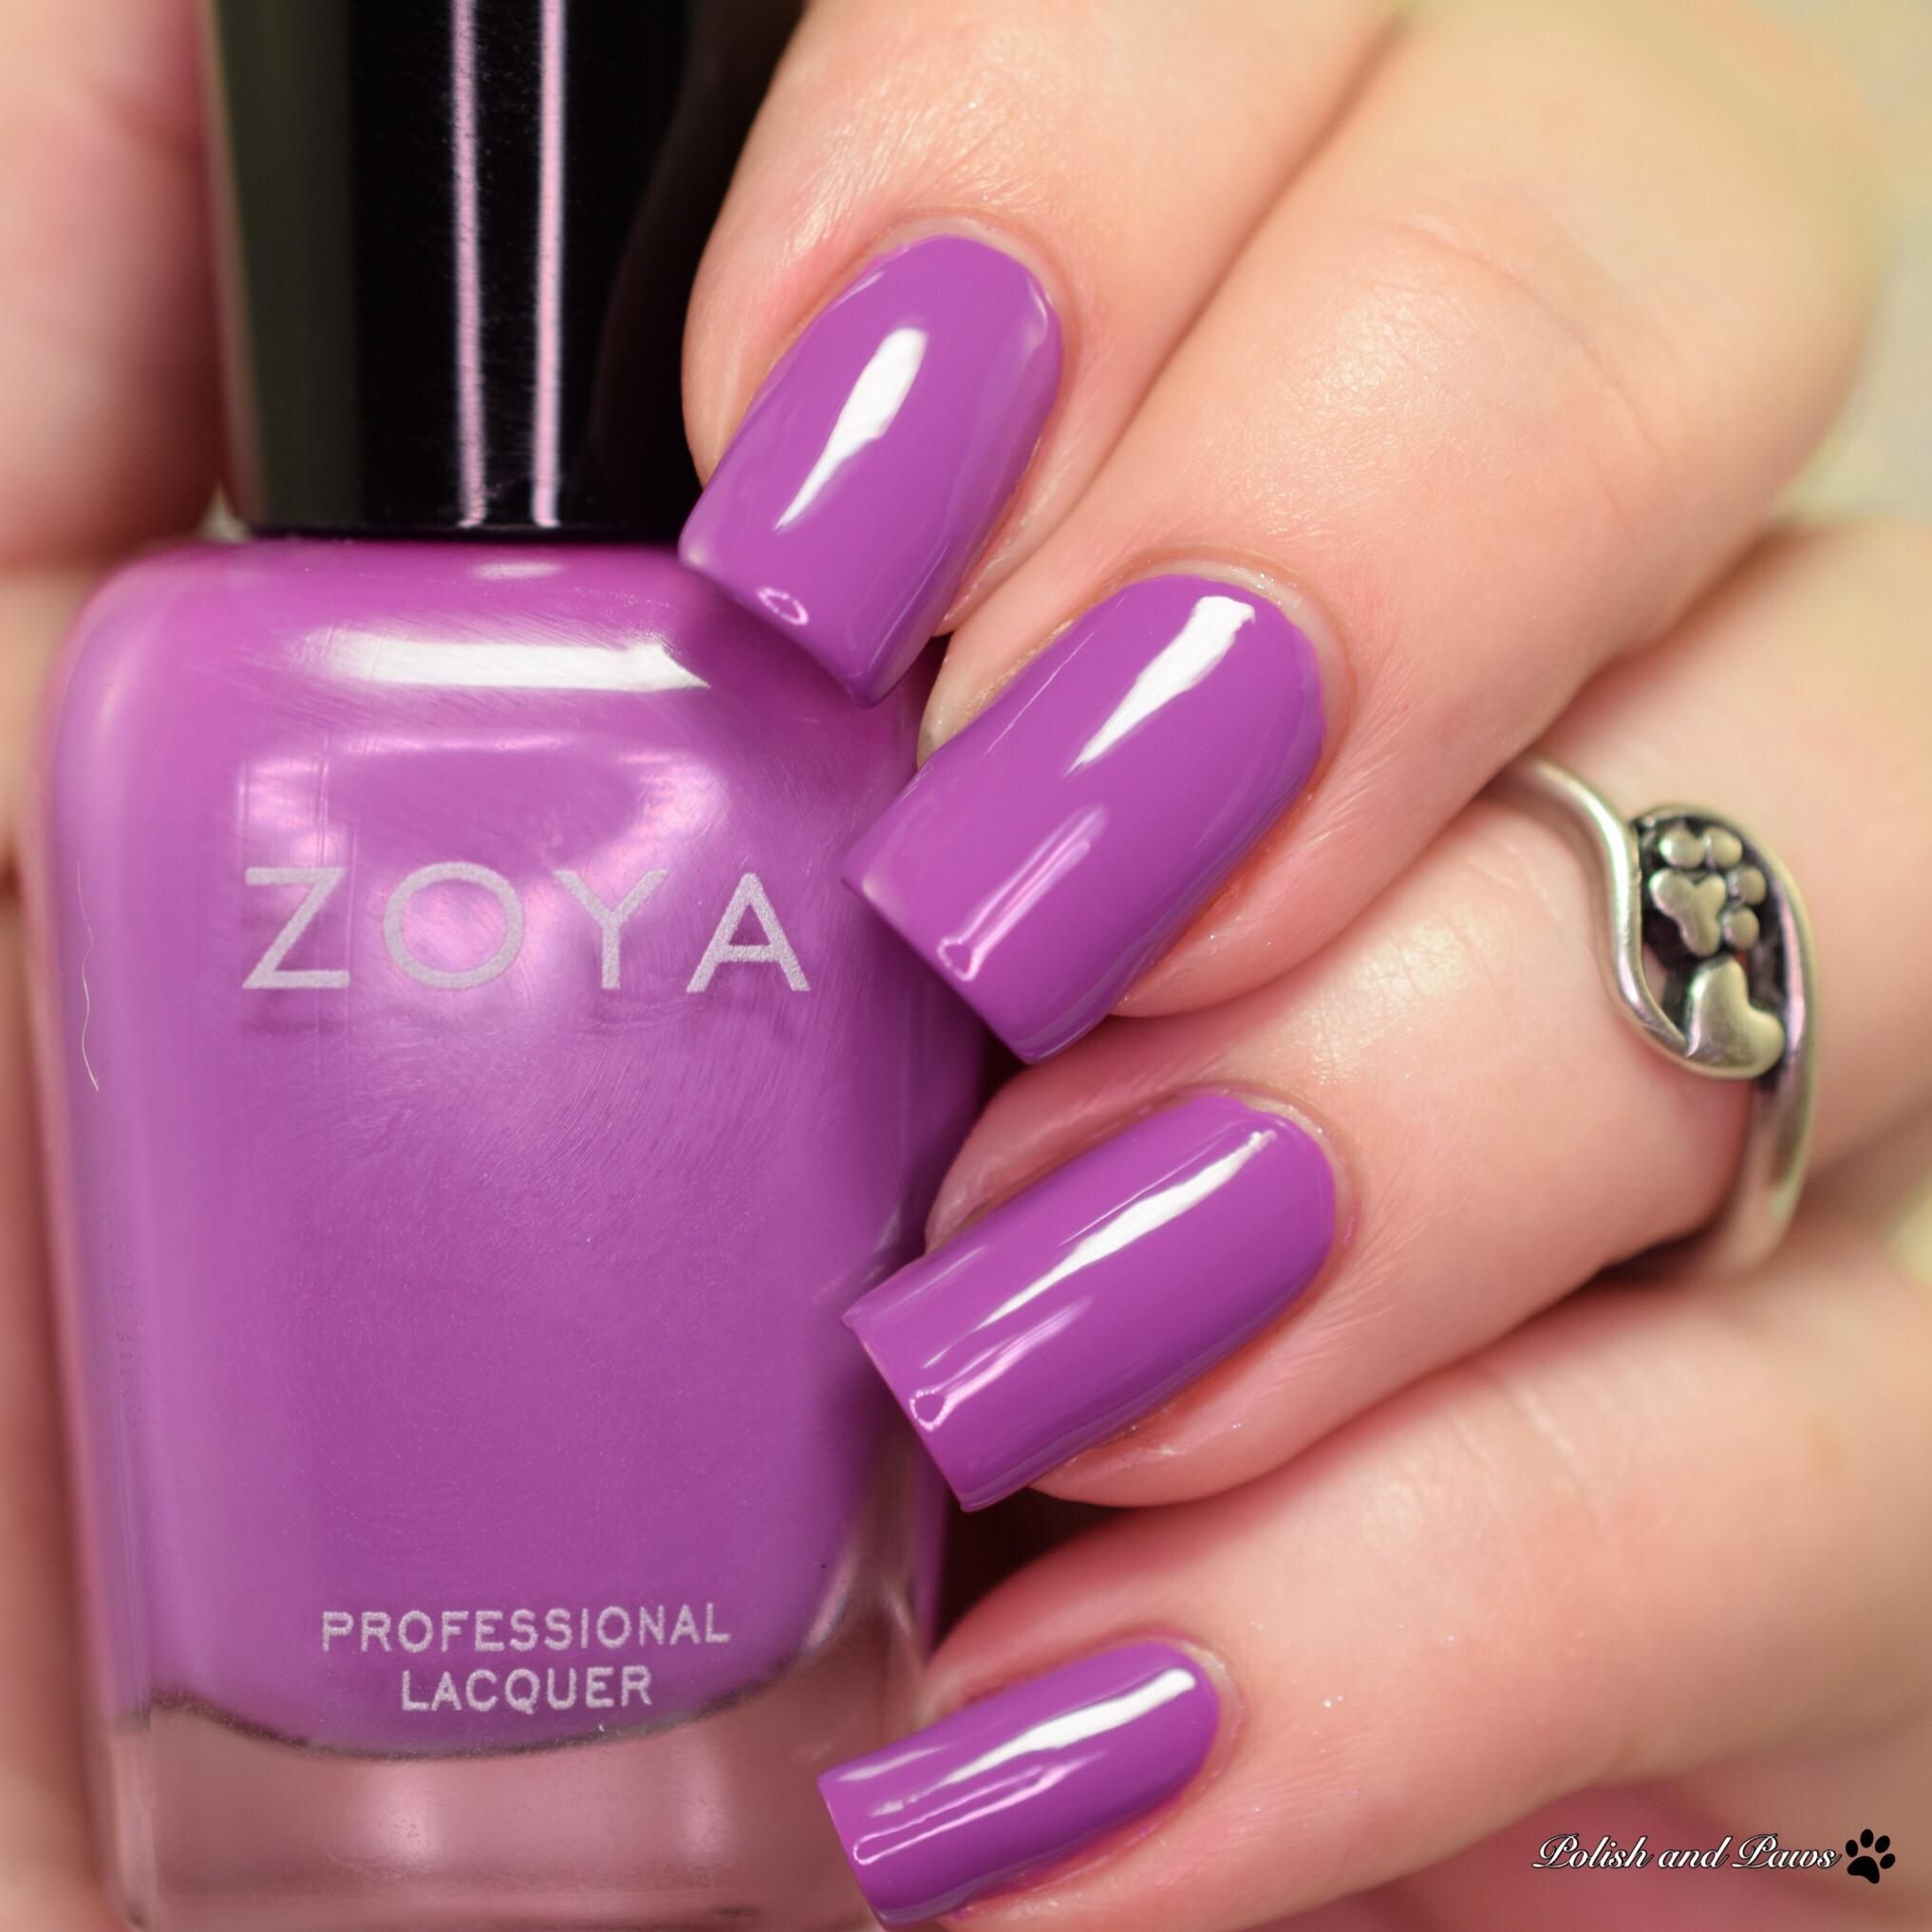 Zoya Lois